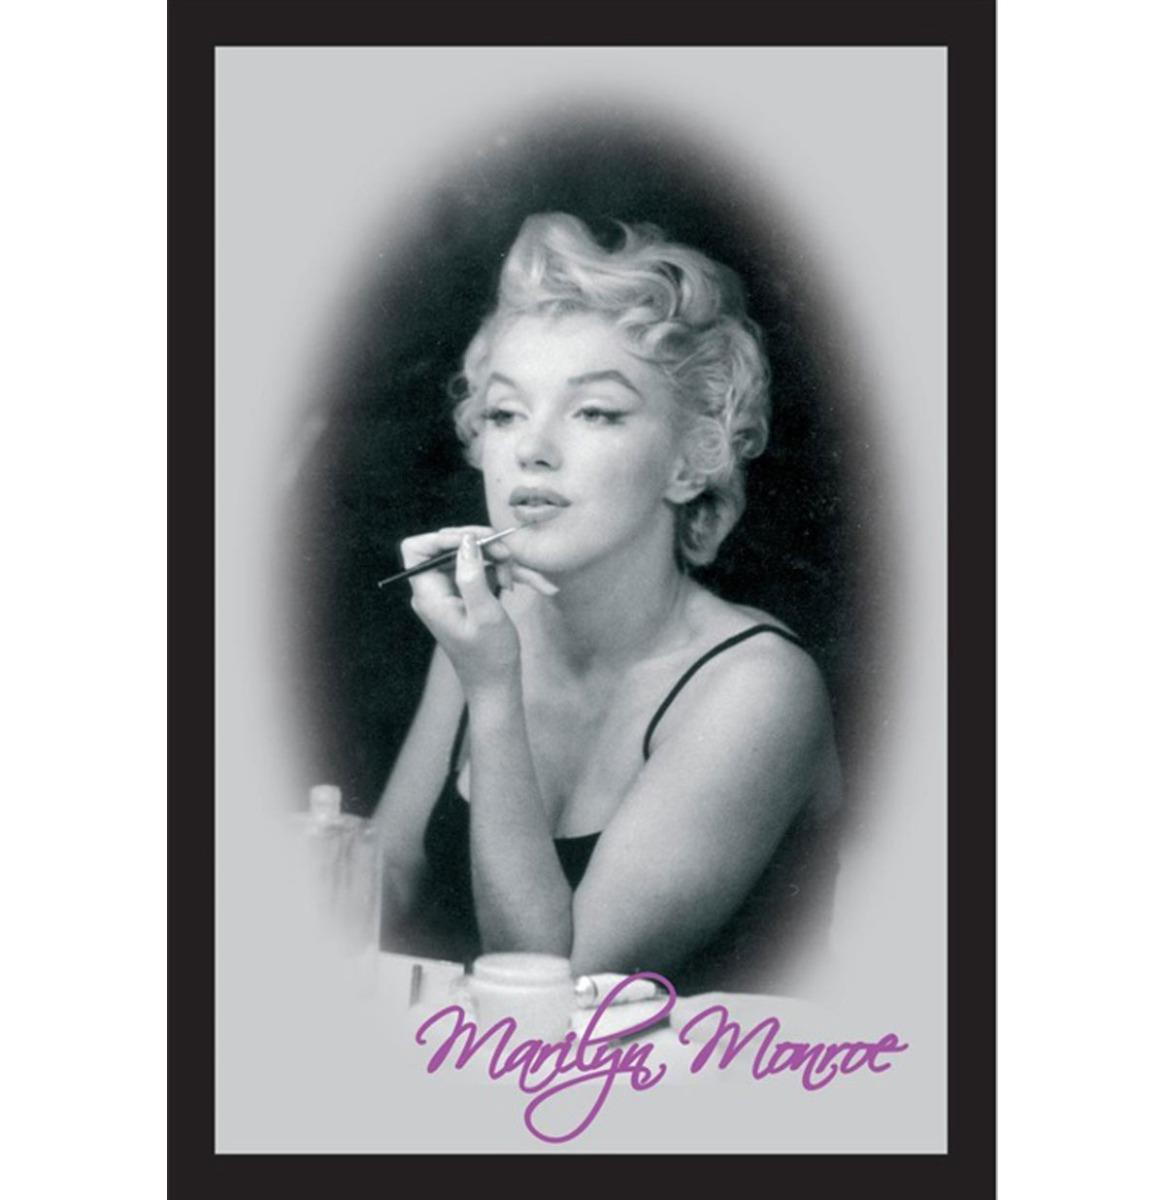 Spiegel Marilyn Monroe Doing Make-up